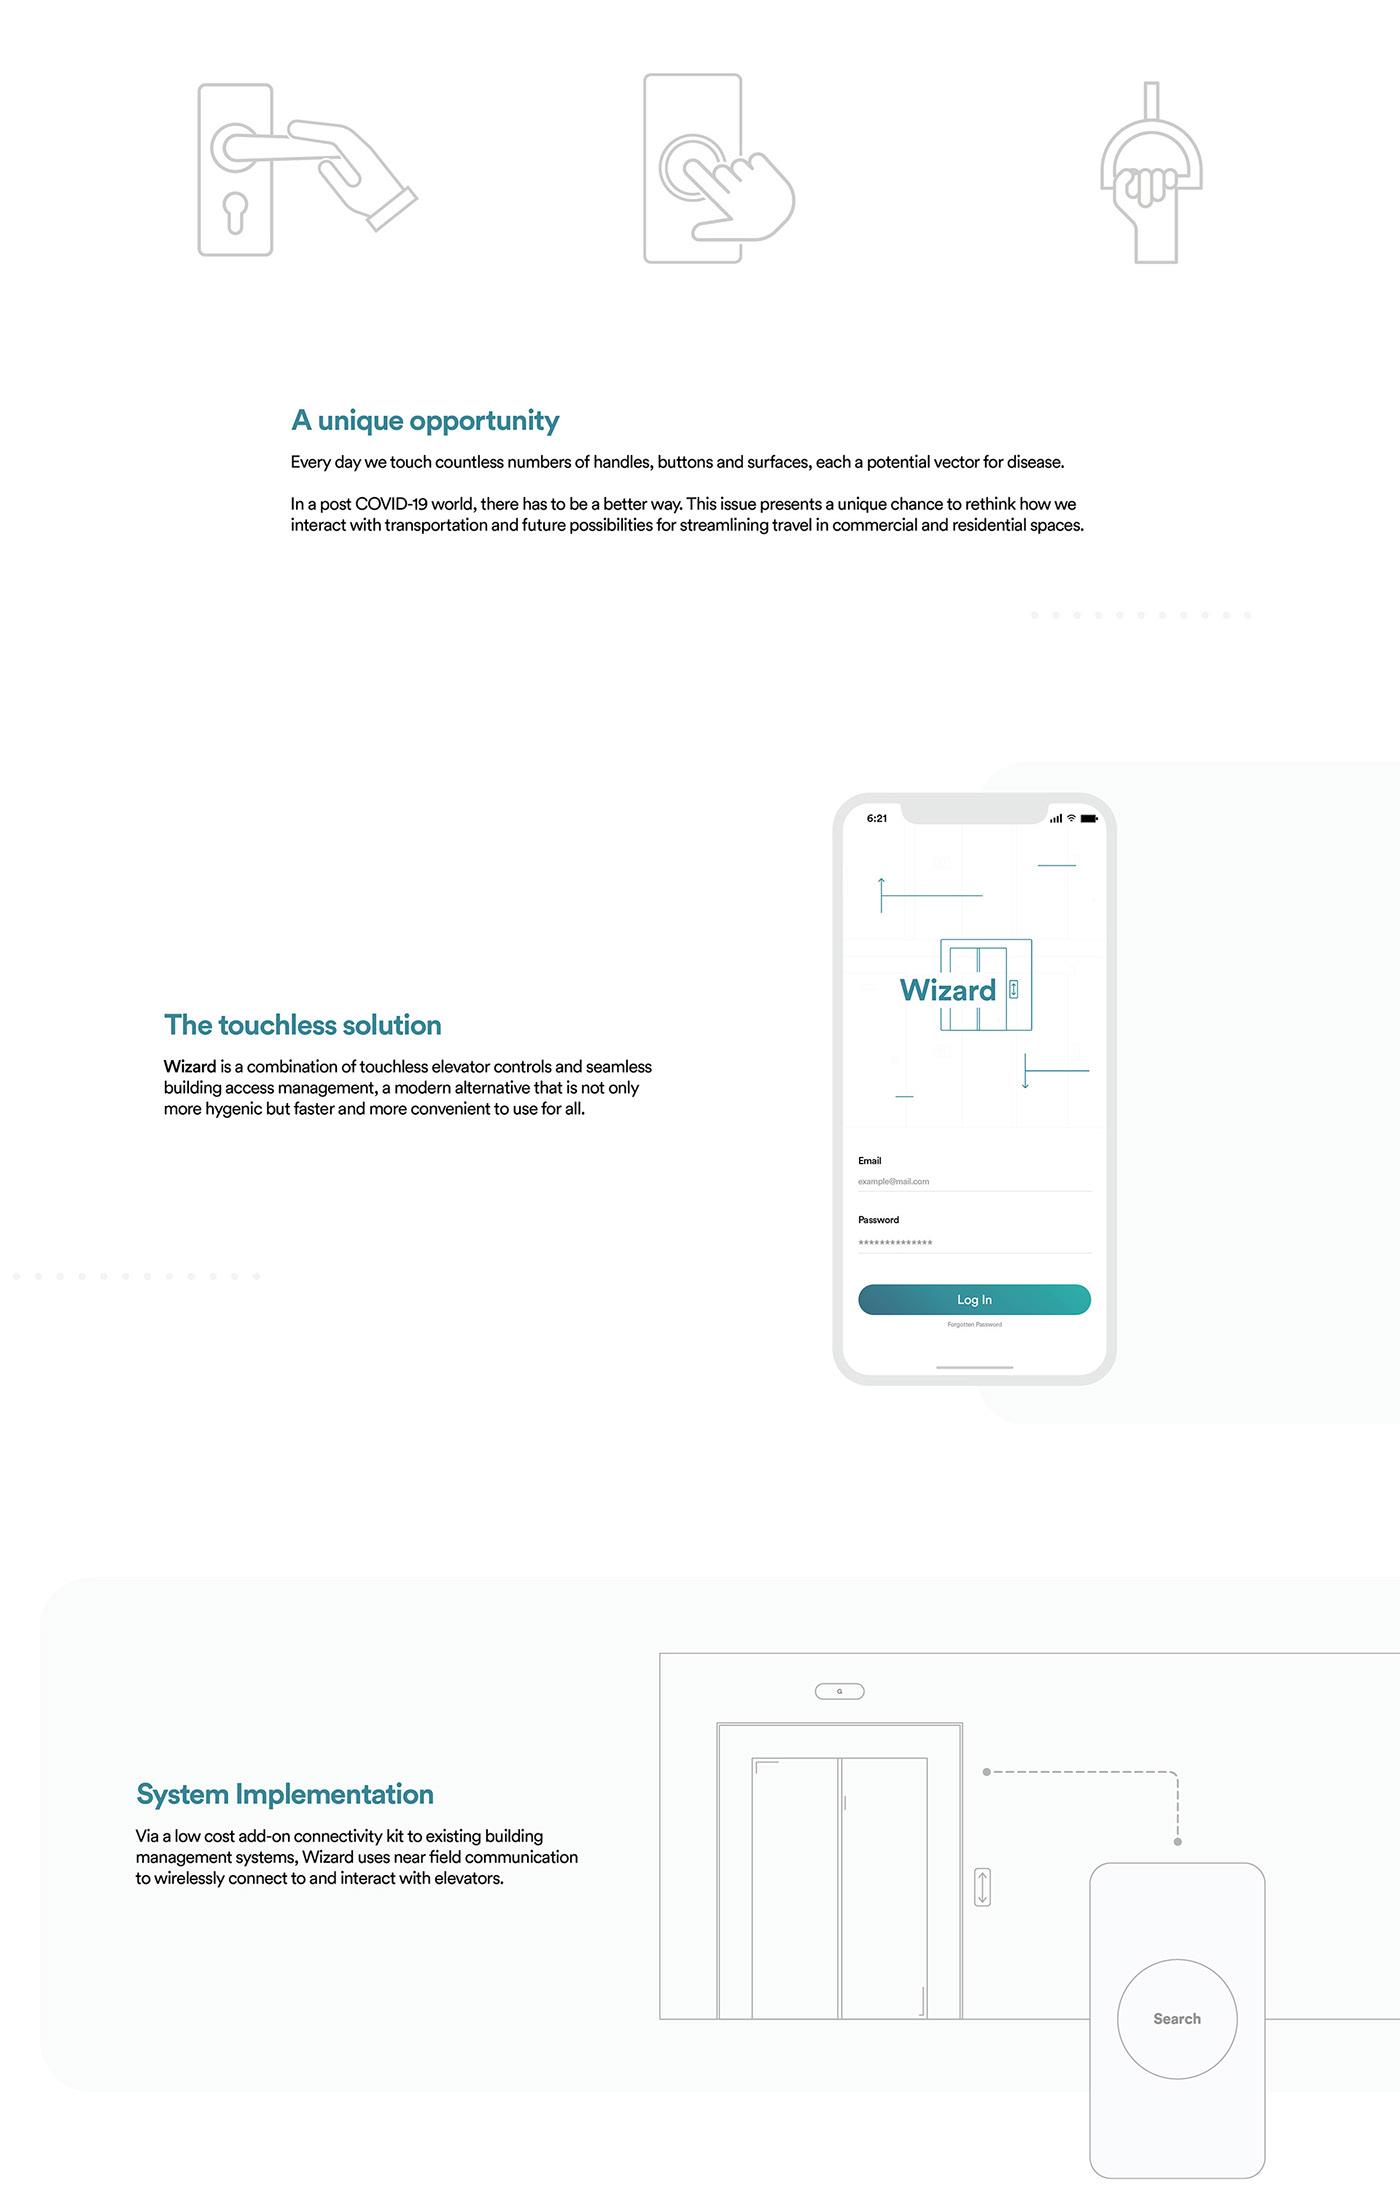 animated app buildings Coronavirus COVID-19 elevator iphone MoGraph smartwatch wireless